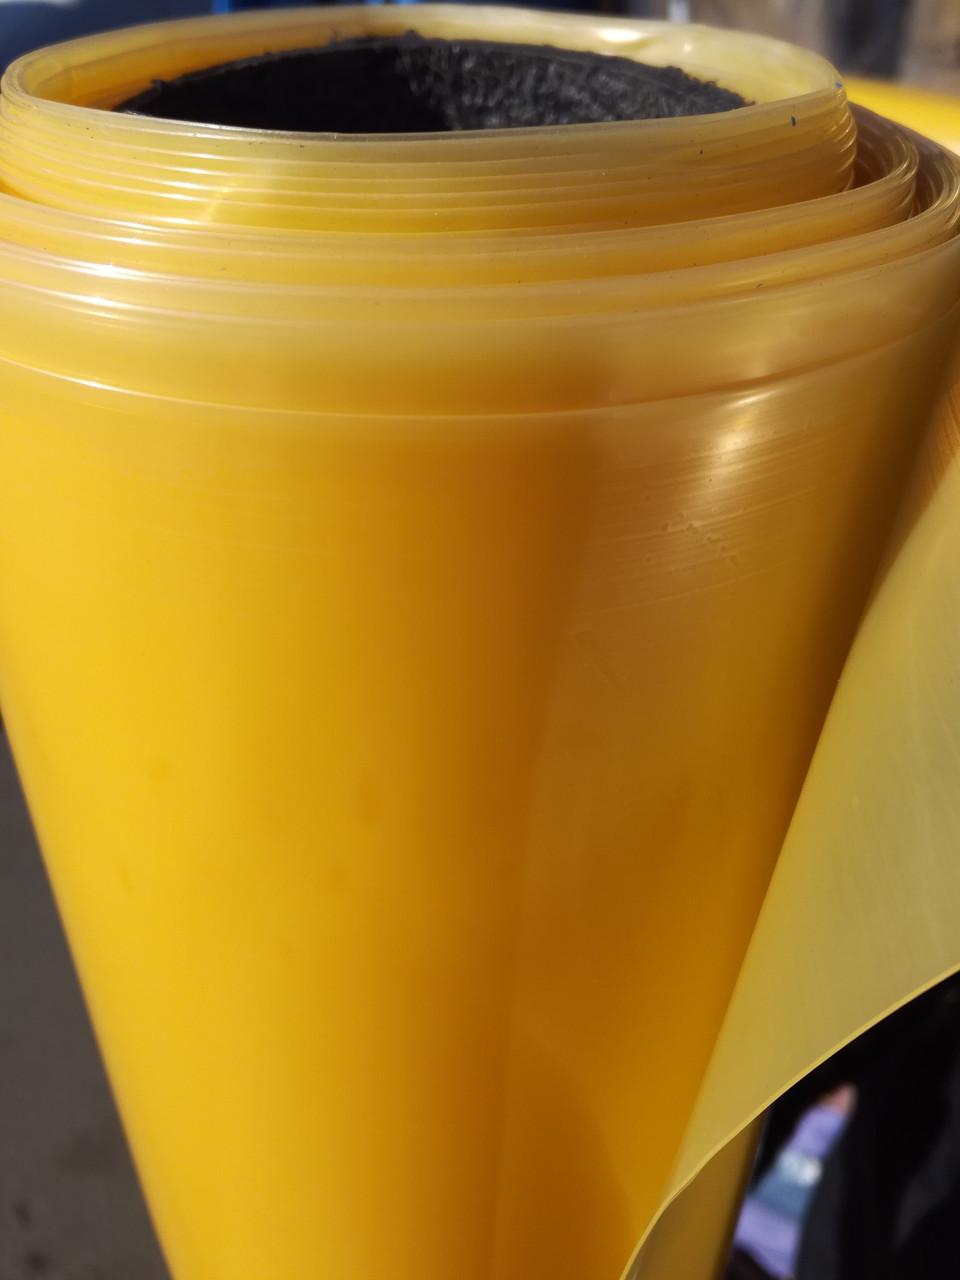 Пленка тепличная стабилизация 12мес. толщина 60 мкм, размер 6мх50м, вес 17 кг